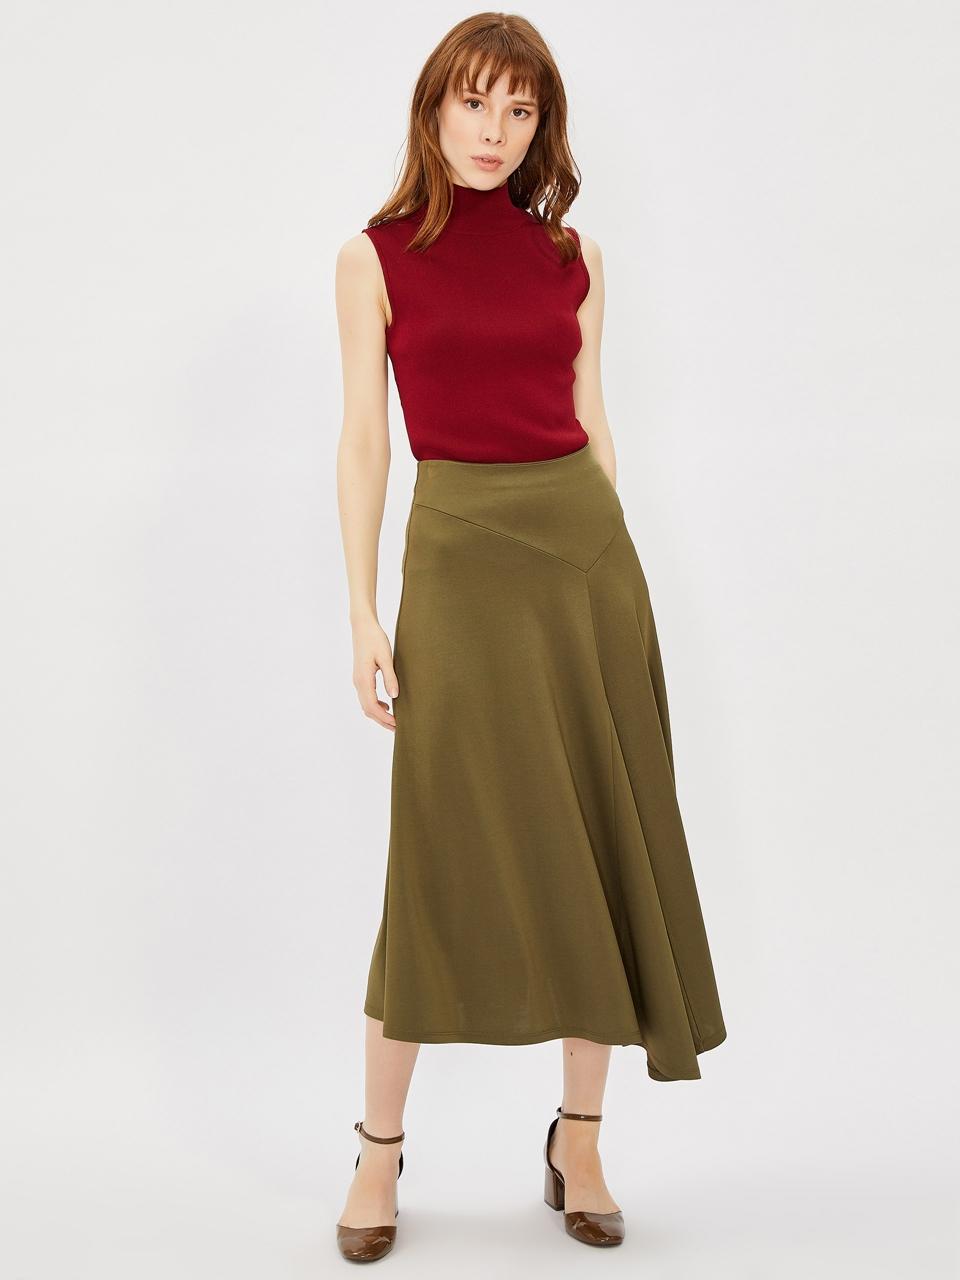 Asymmetrical Cut Midi Size Skirt